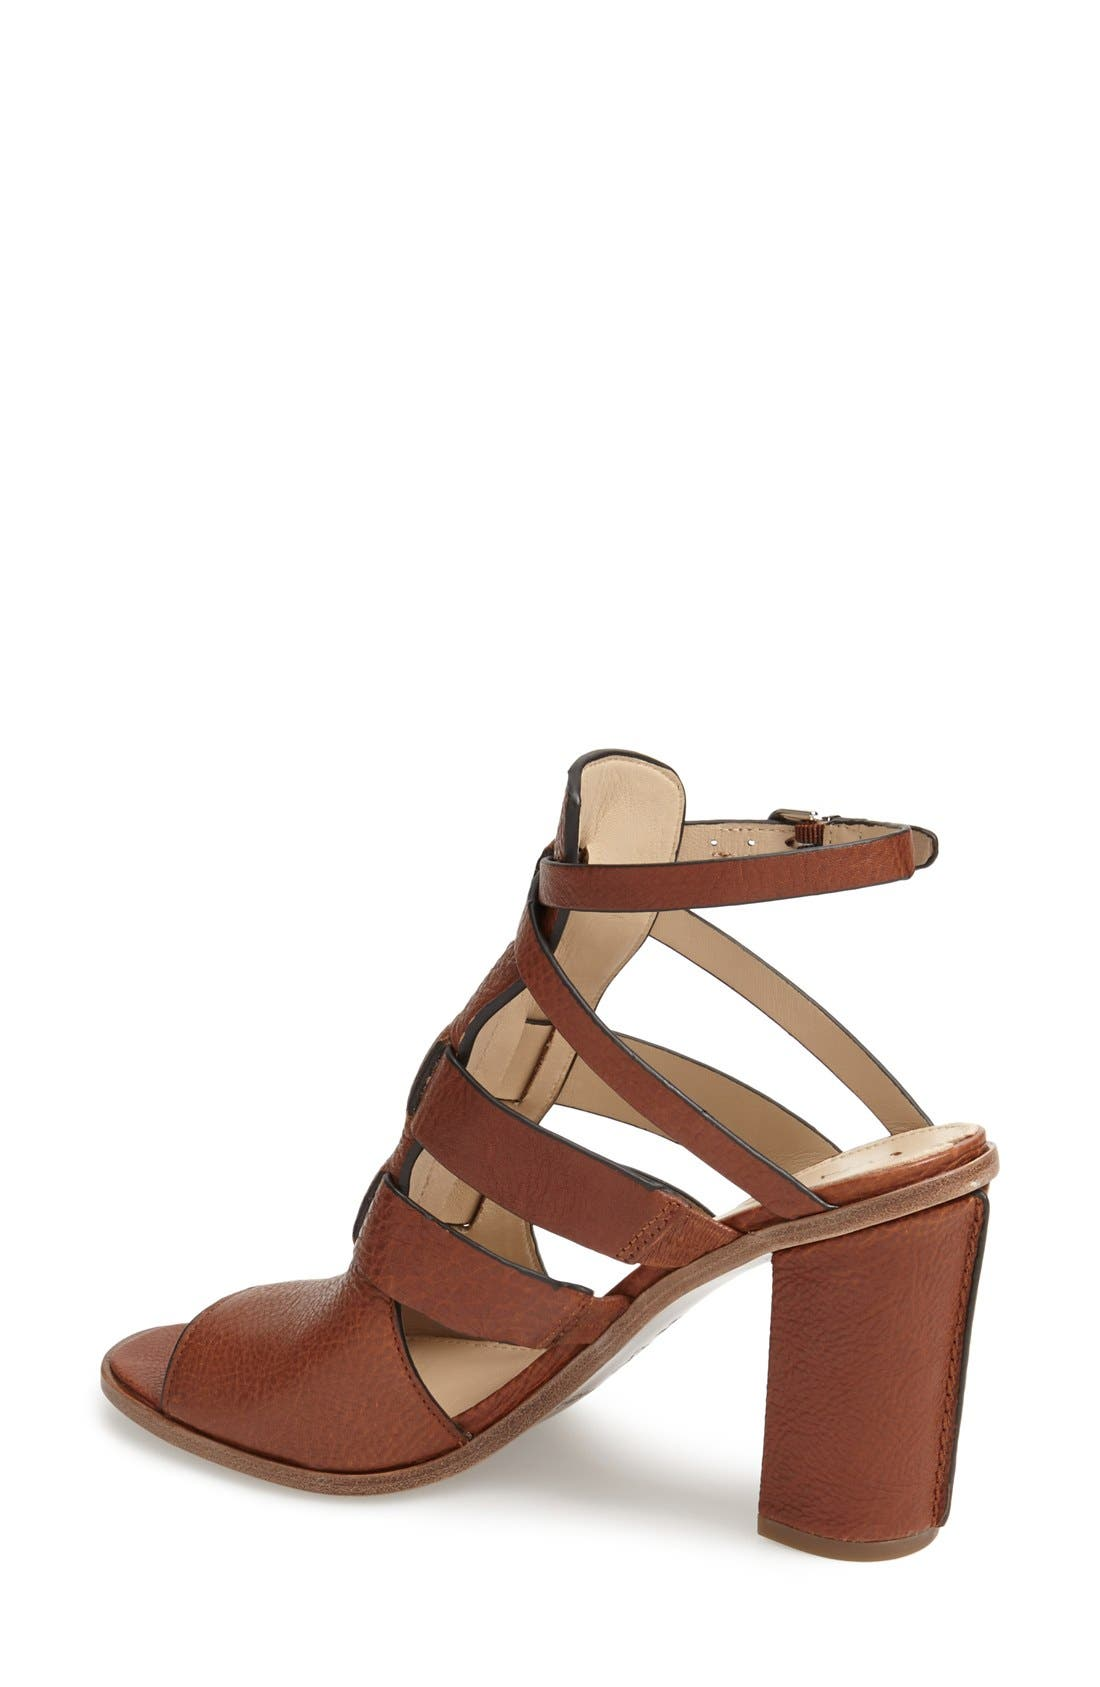 Alternate Image 2  - Via Spiga 'Brandina' Leather Sandal (Women)